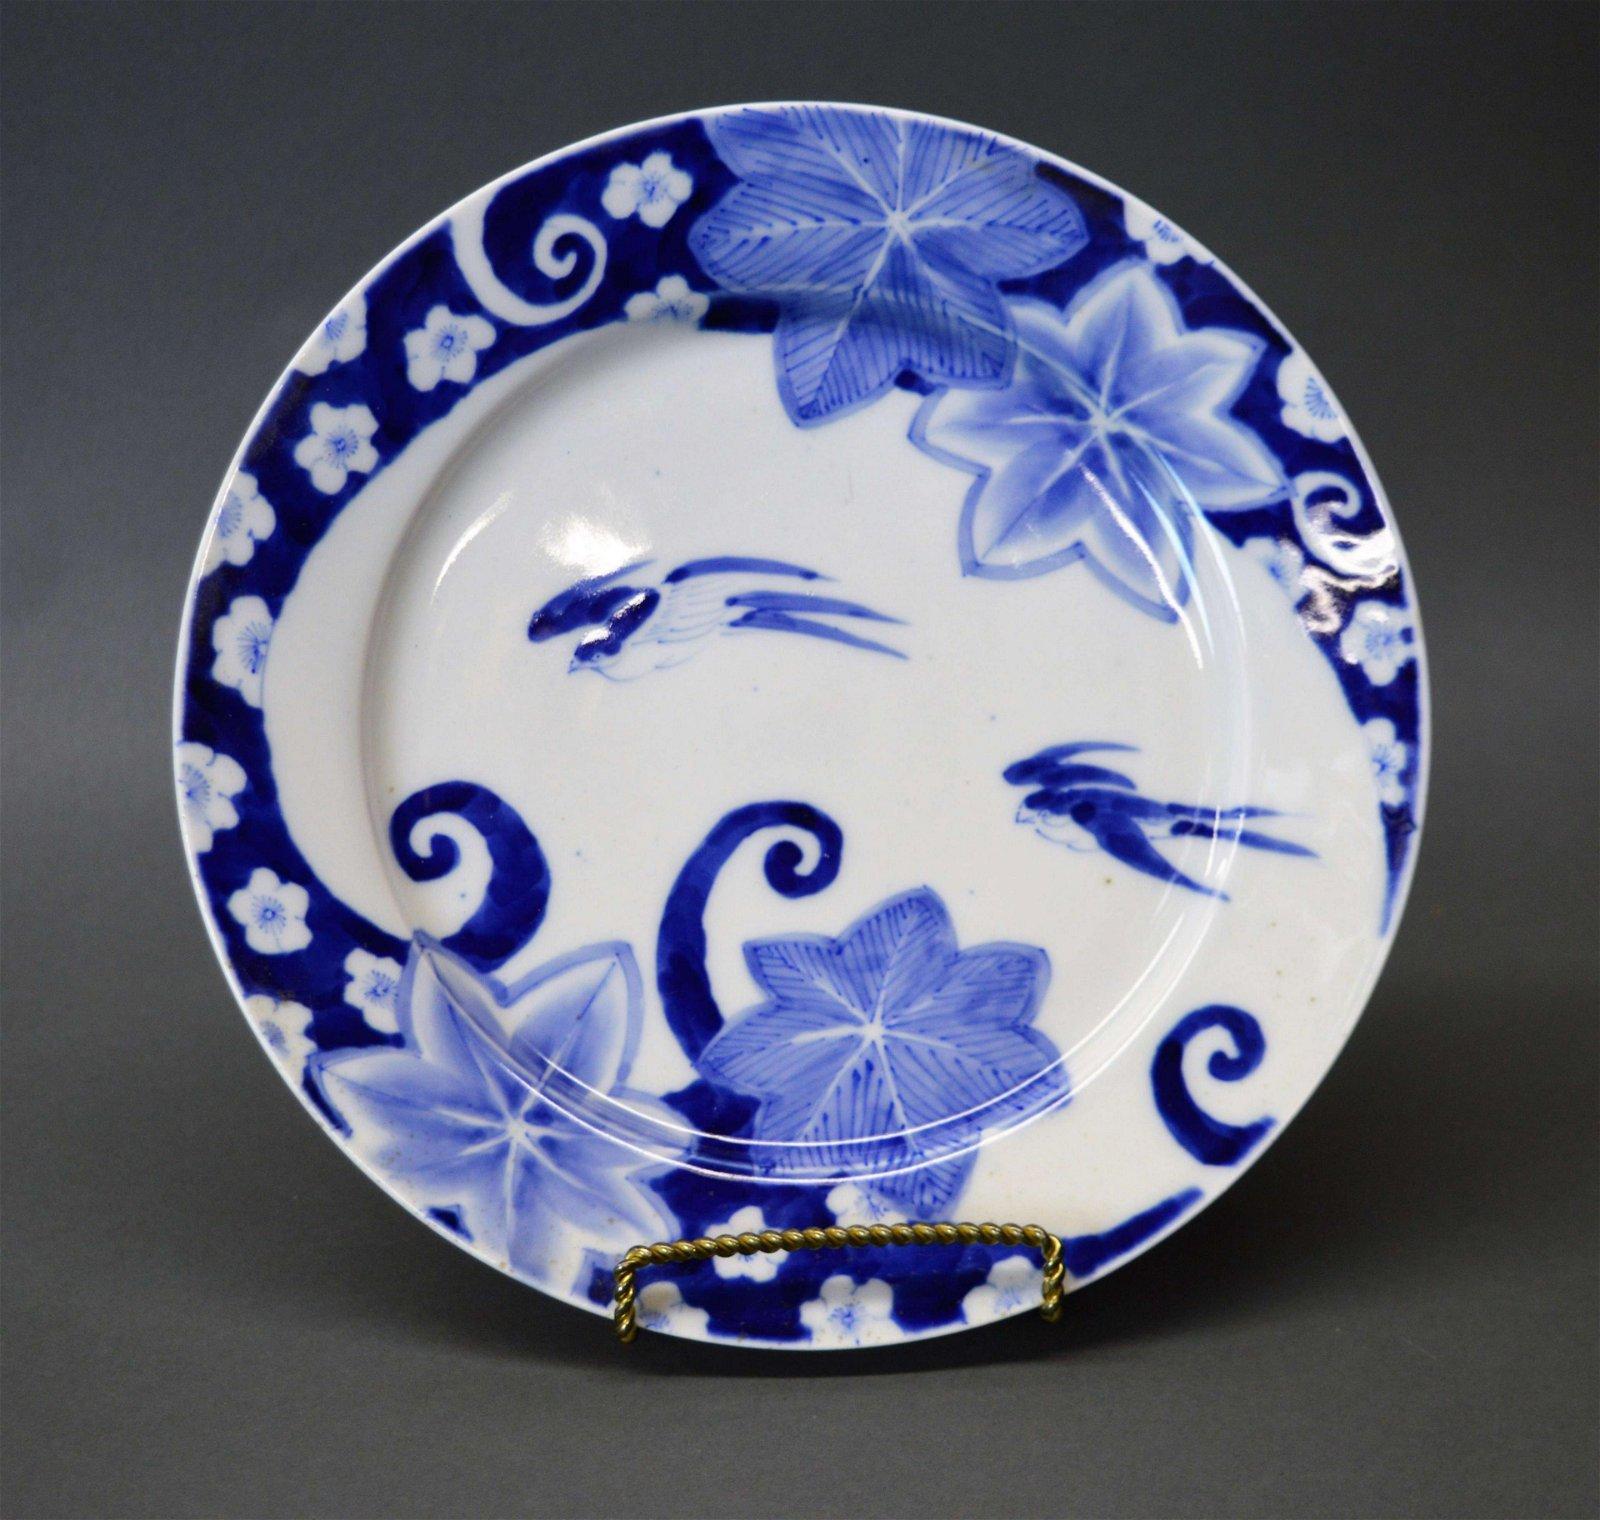 Japanese Arita Porcelain Plate